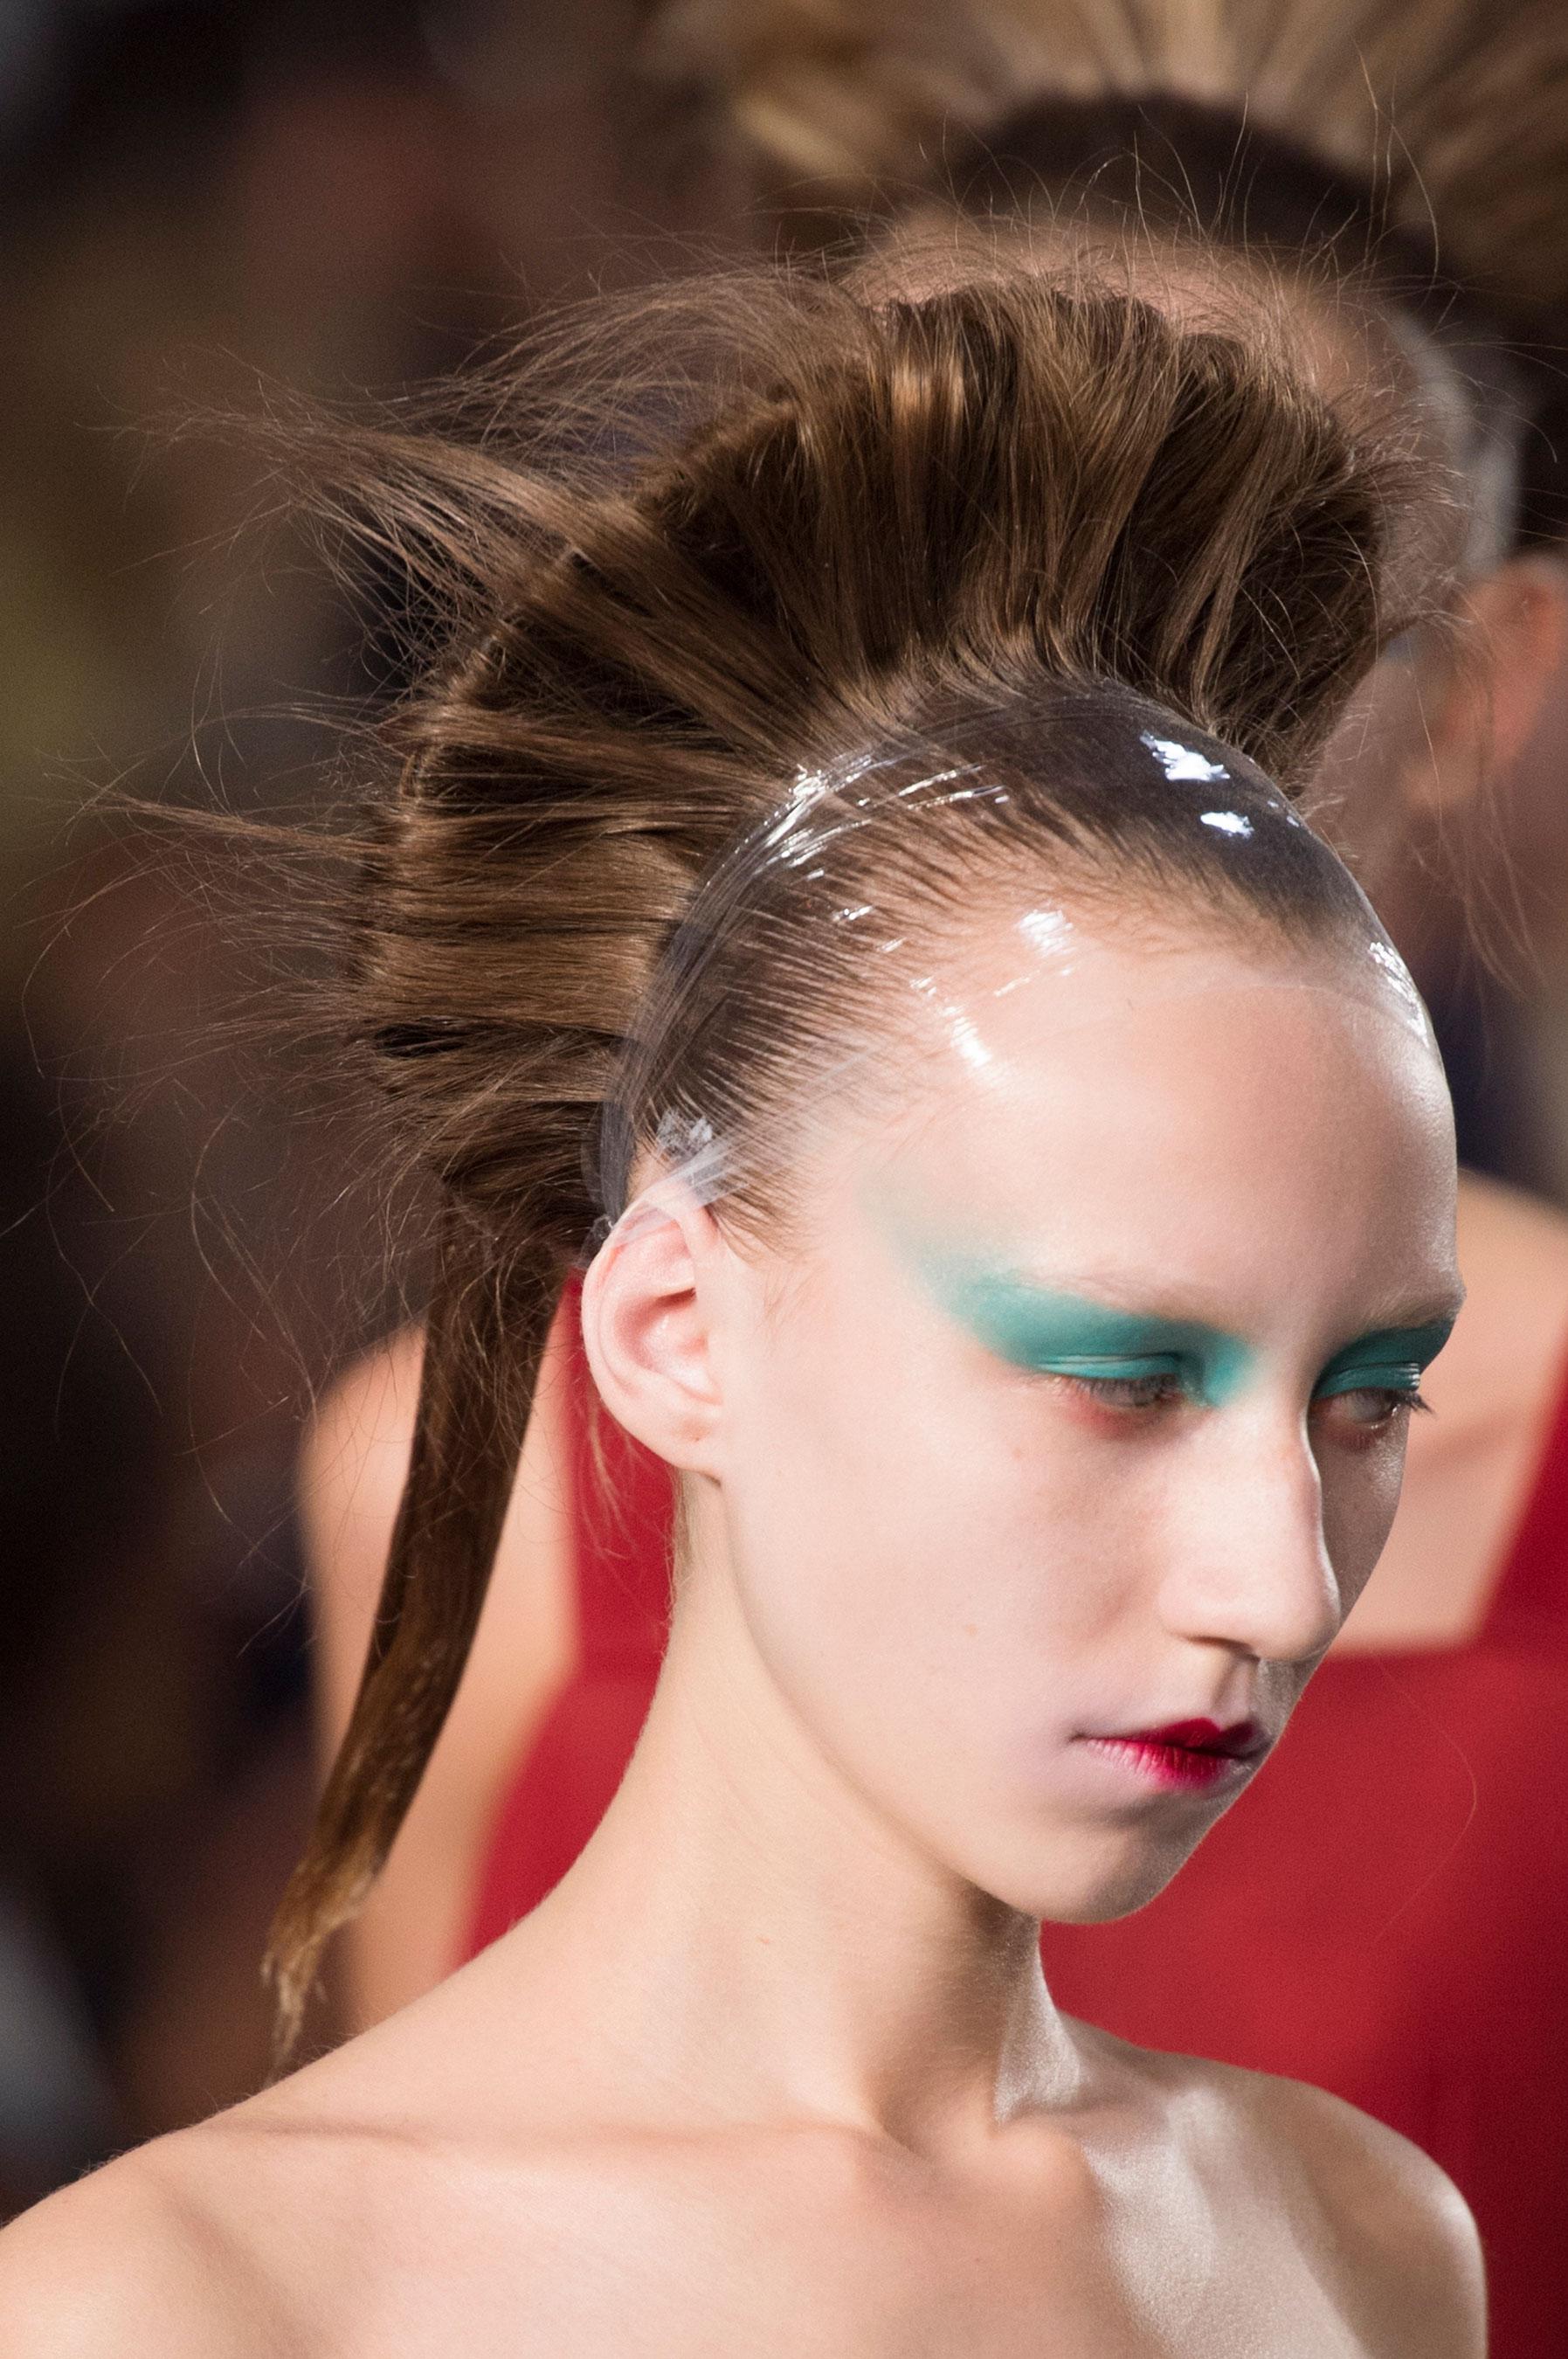 Maison-Margiela-spring-2016-runway-beauty-fashion-show-the-impression-092